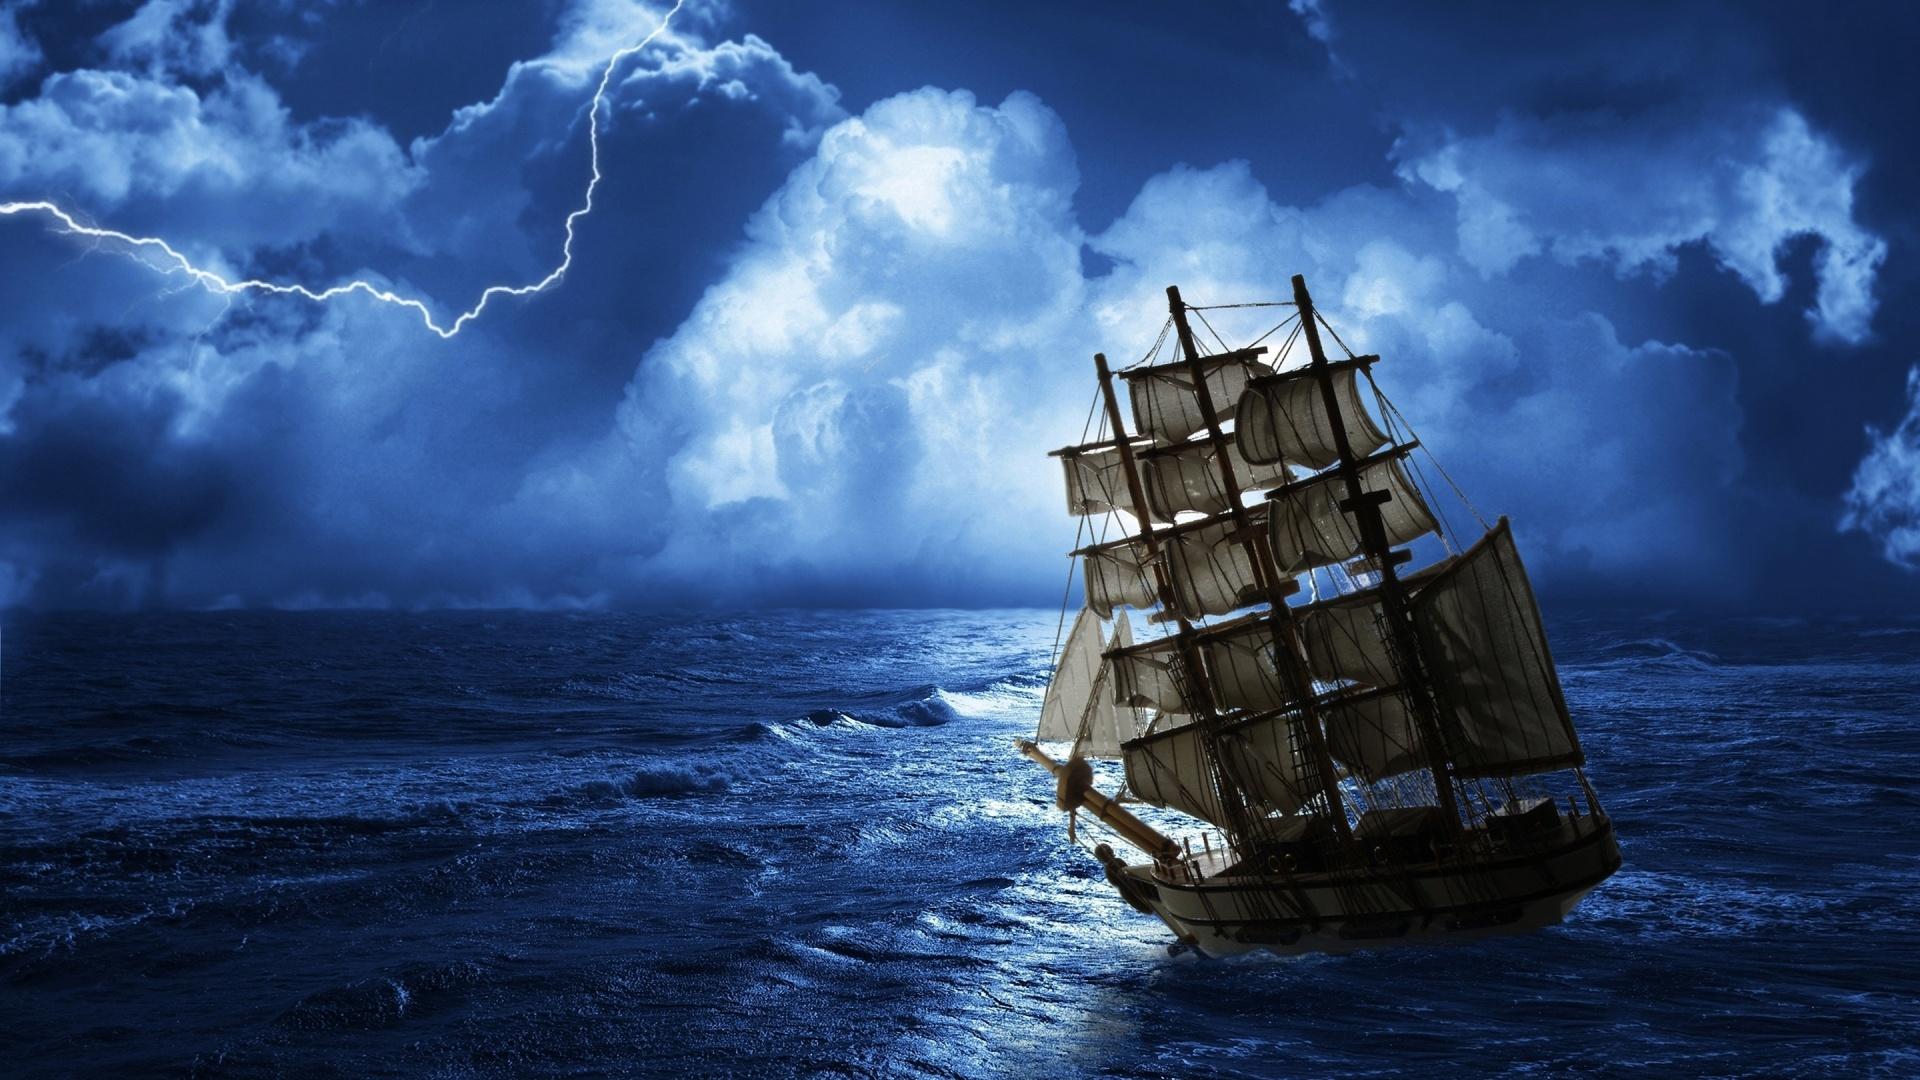 44 Ship Wallpapers For Desktop On Wallpapersafari